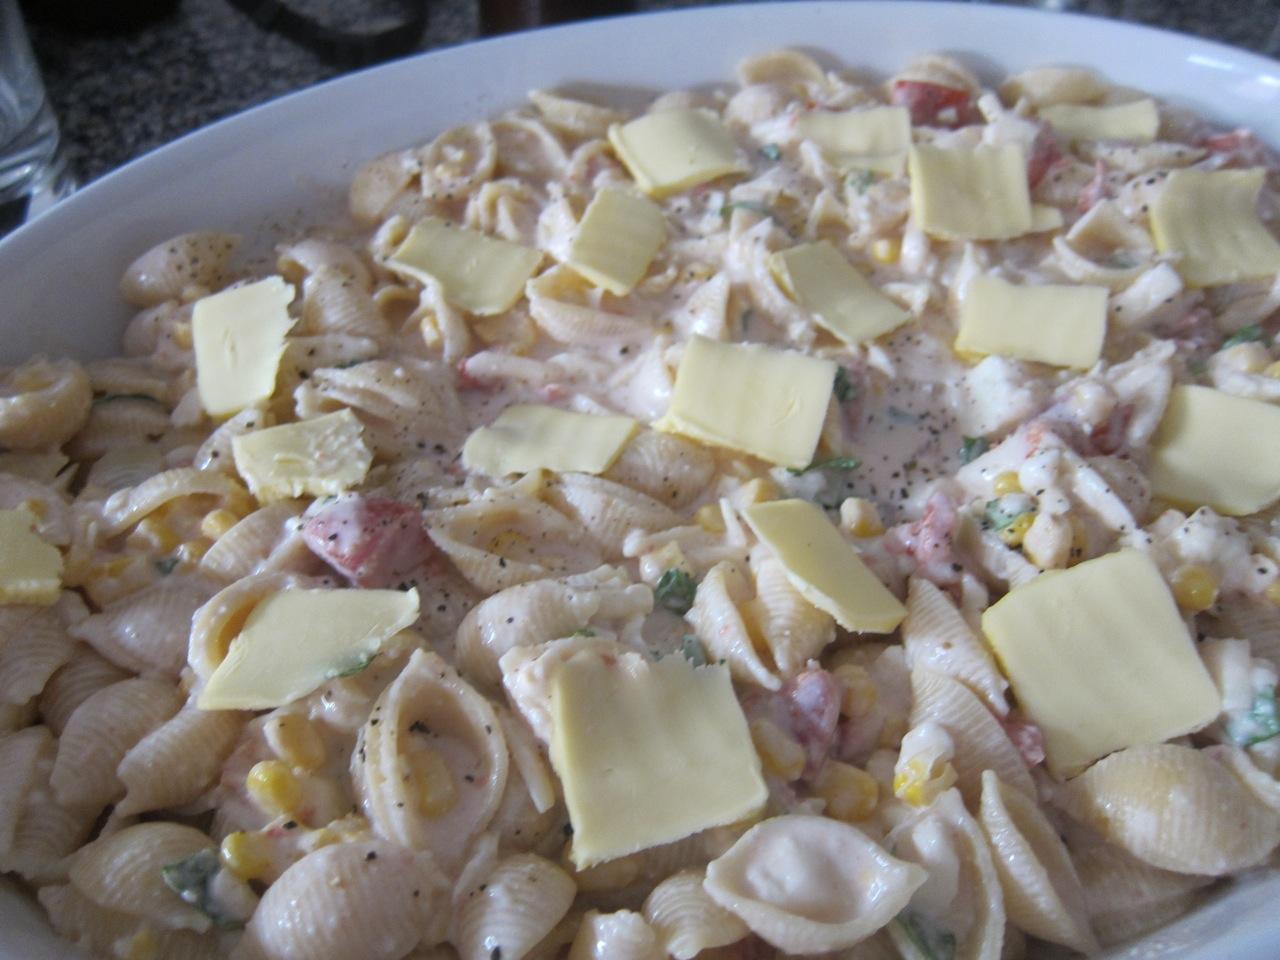 ... : Al Forno's Baked Pasta with Five Cheeses, Tomato, Cream, and Corn